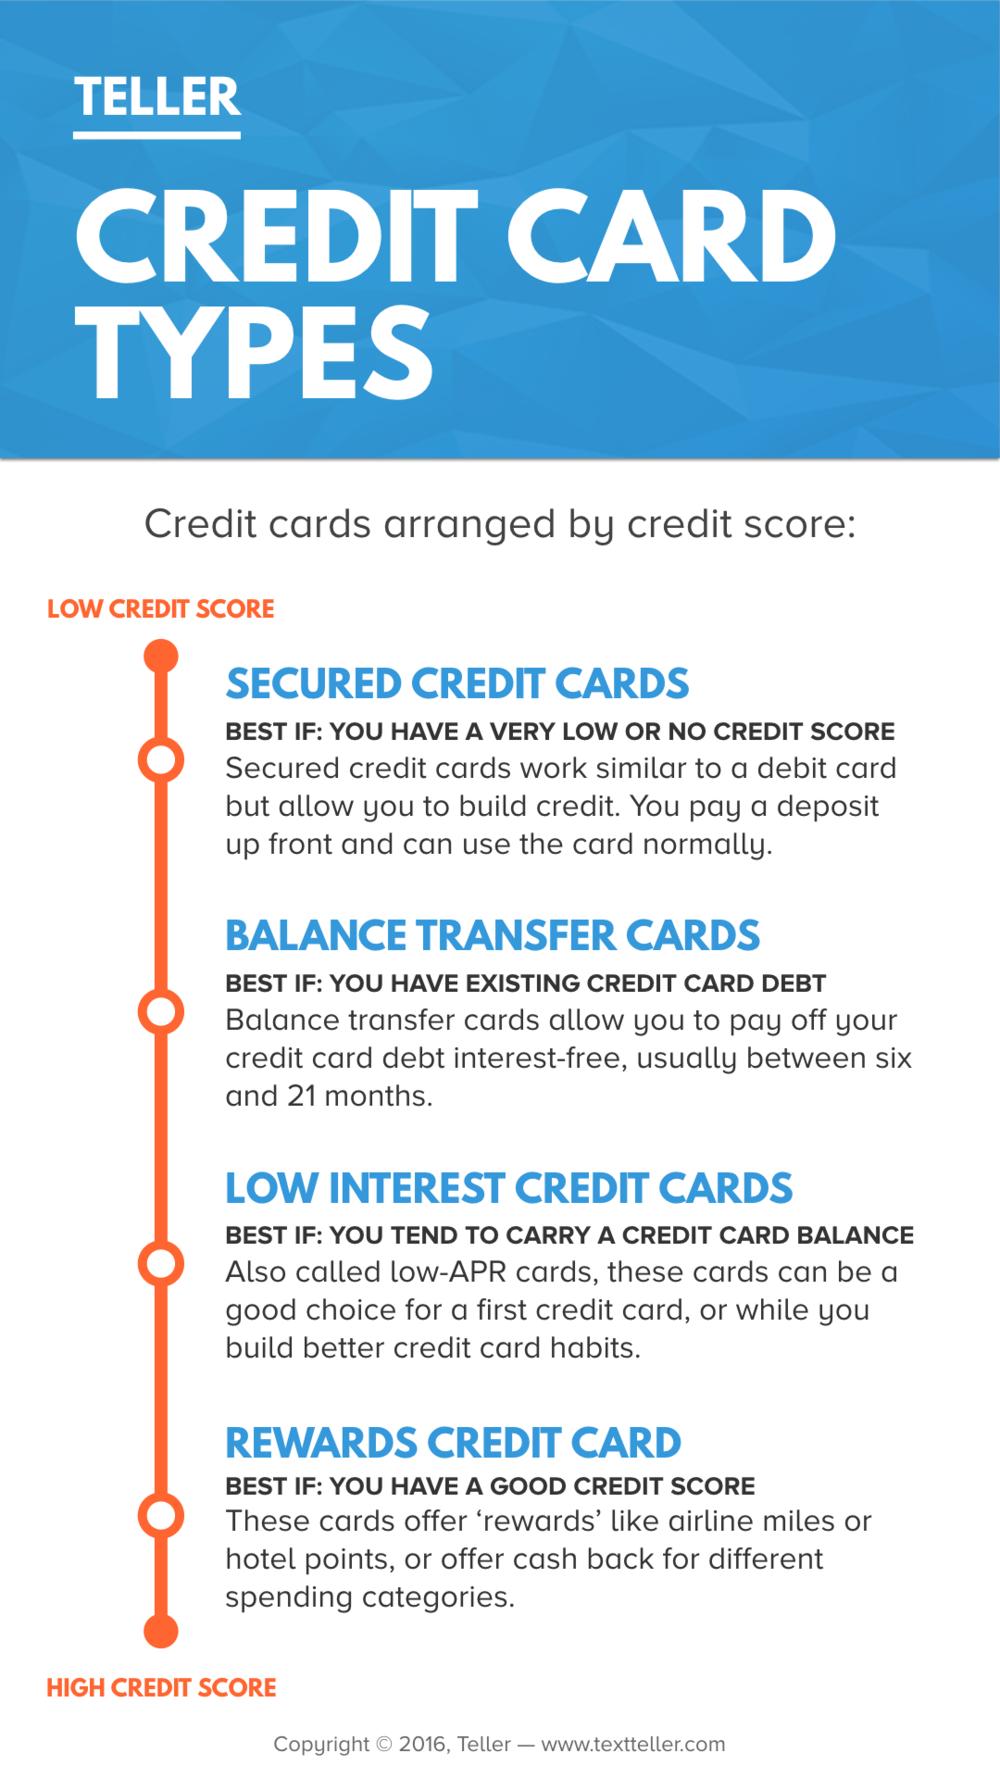 teller_credit_card_types.png